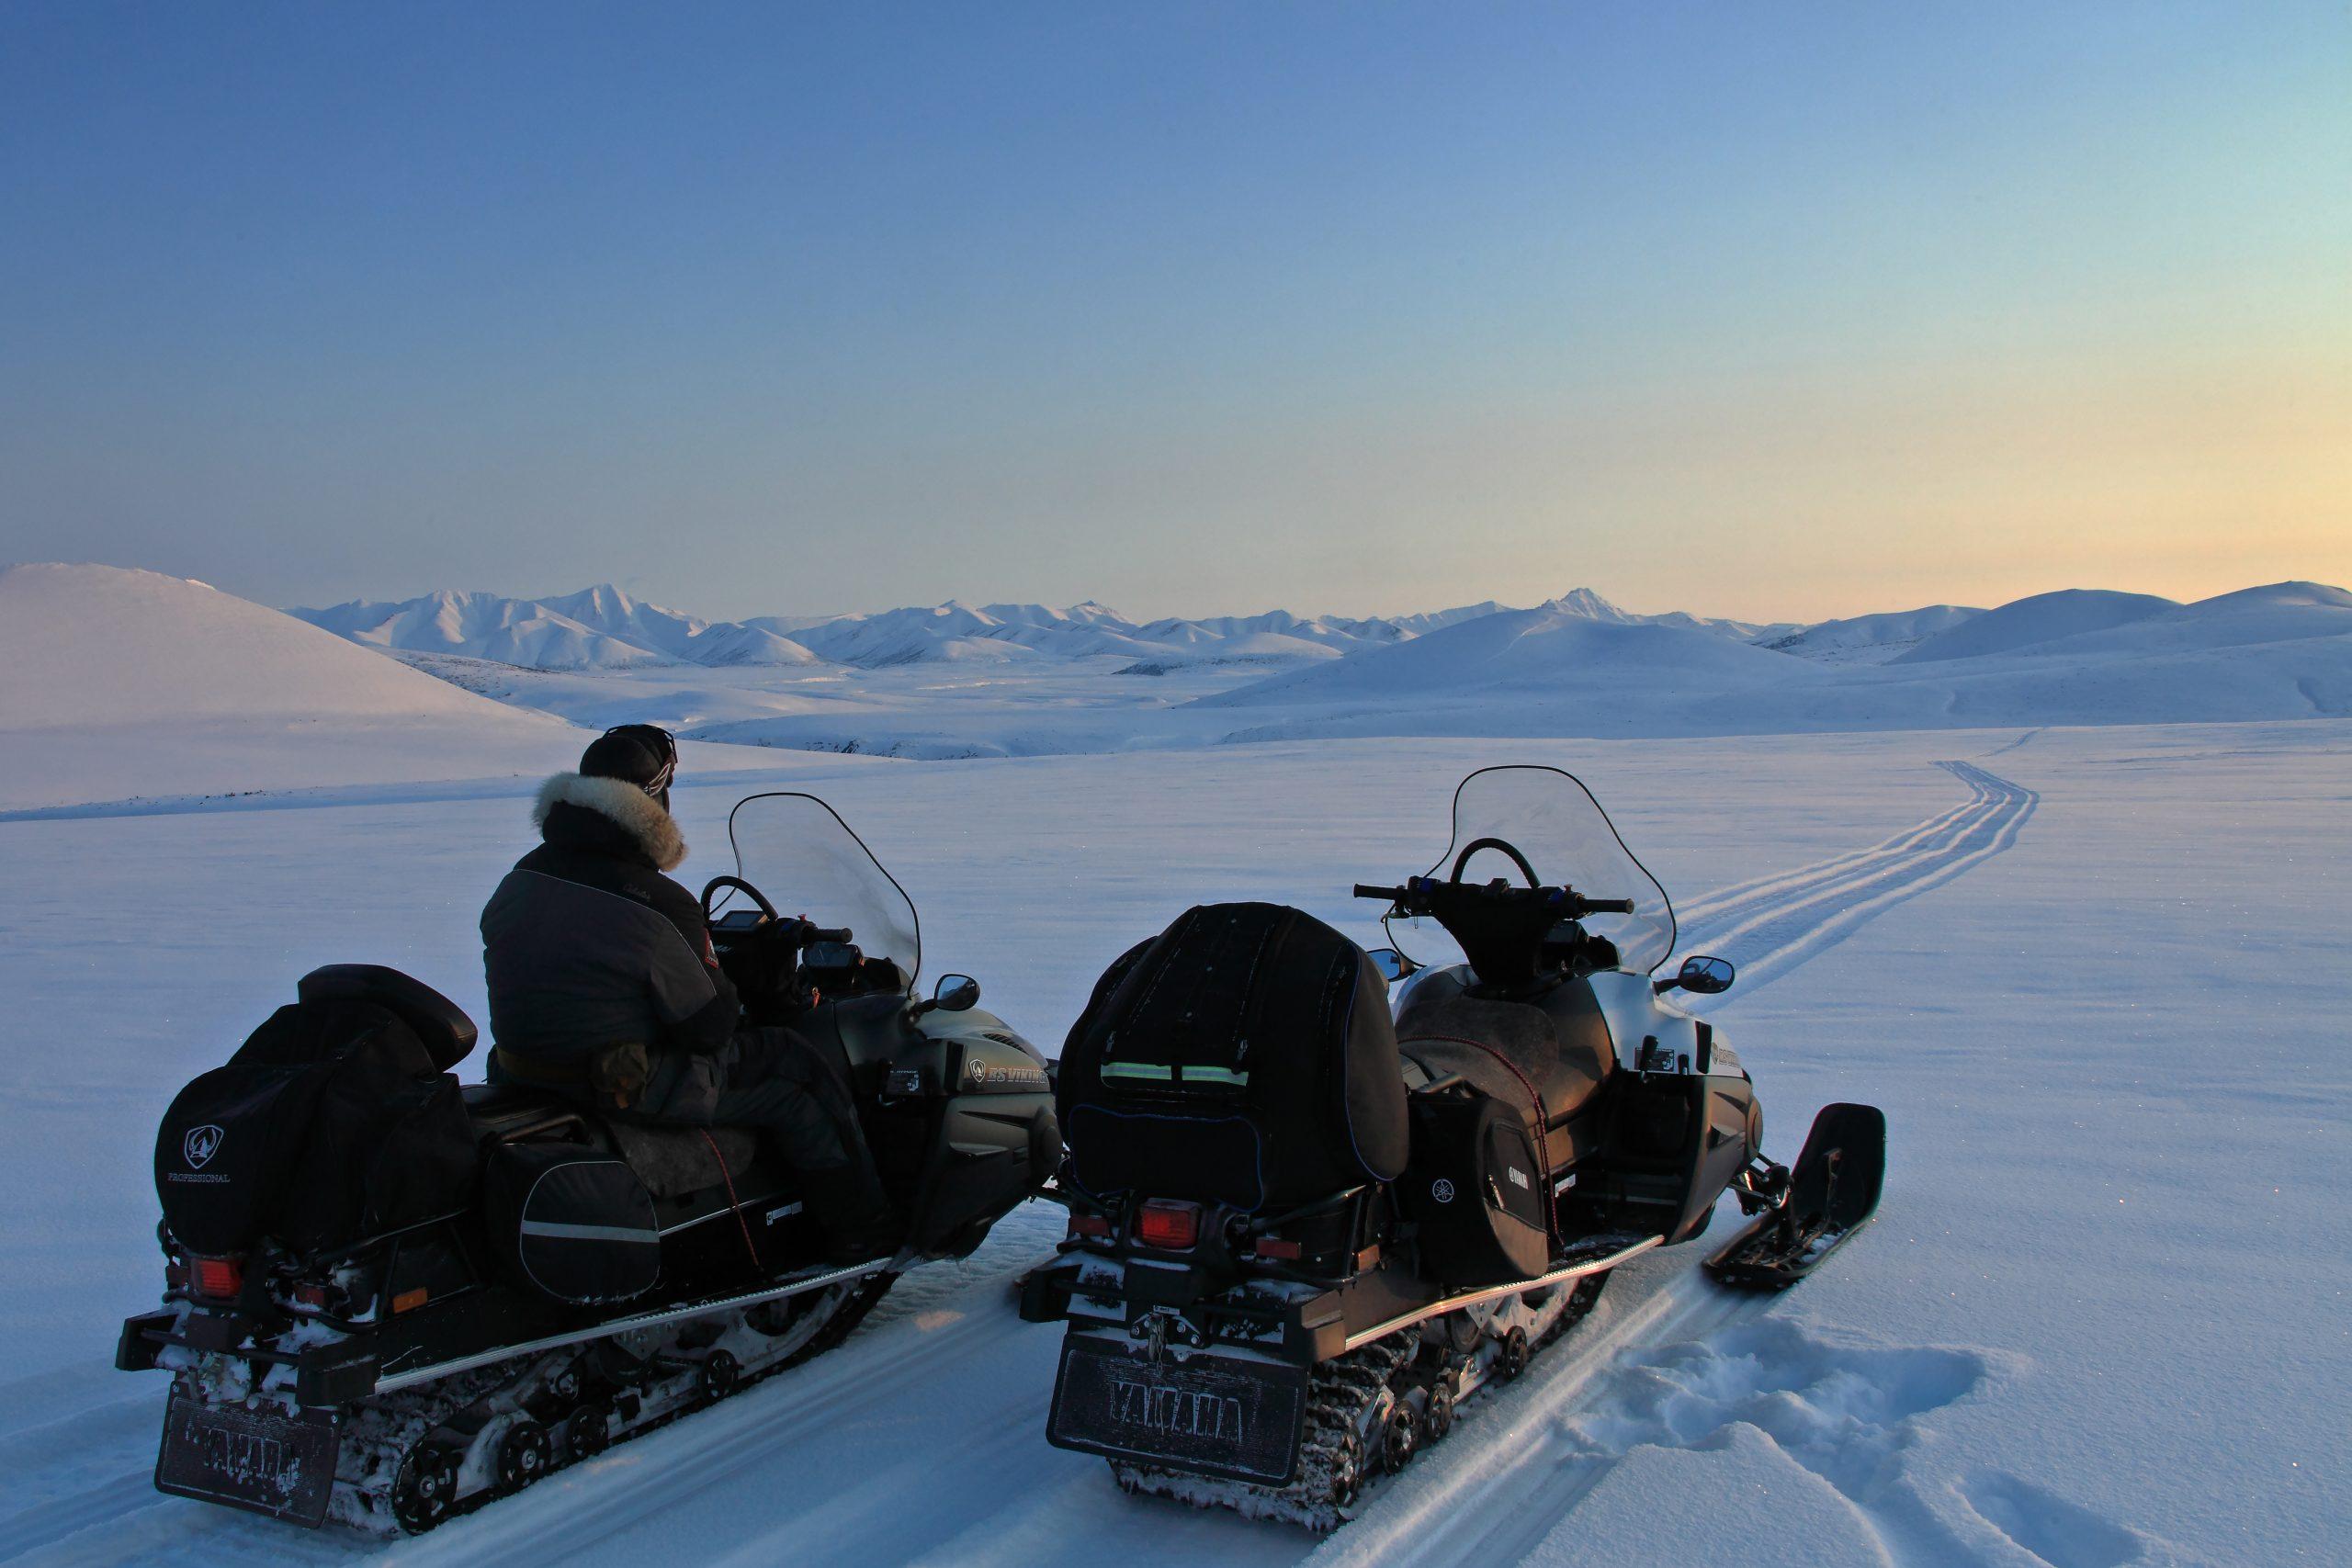 Дорога на рыбалку к озеру Майаниц зимой